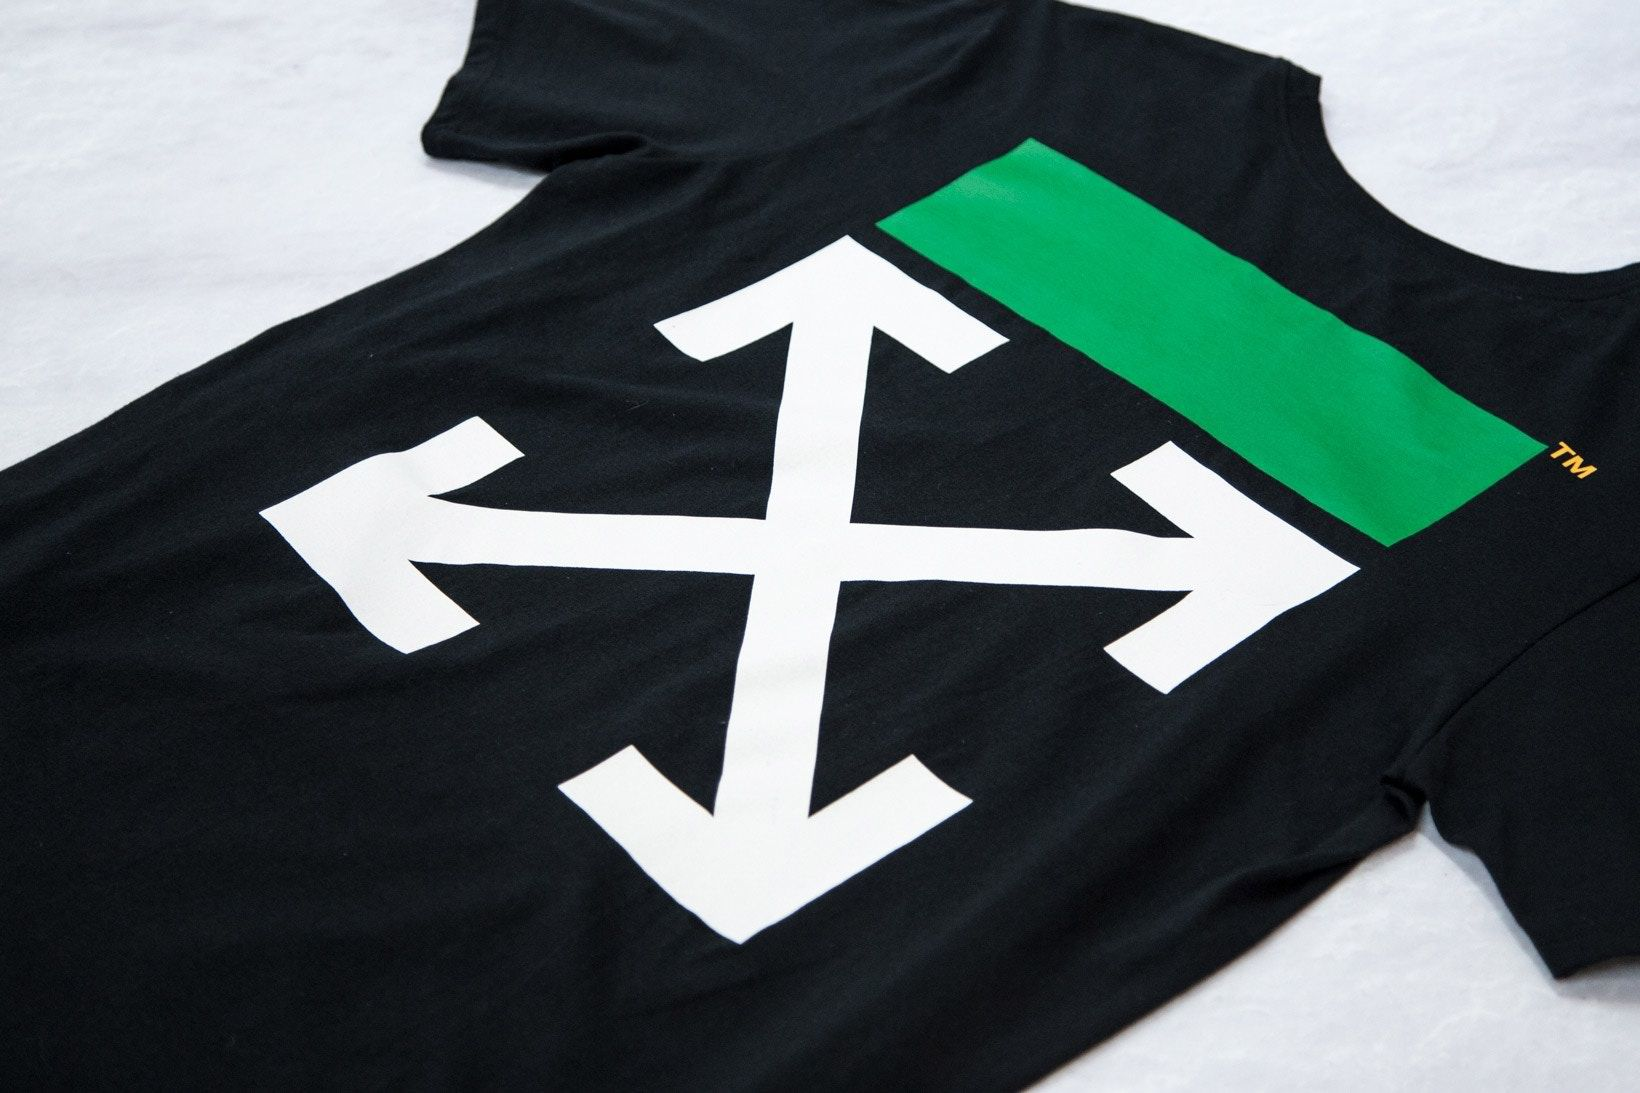 Off White x Nike - Equality Tee